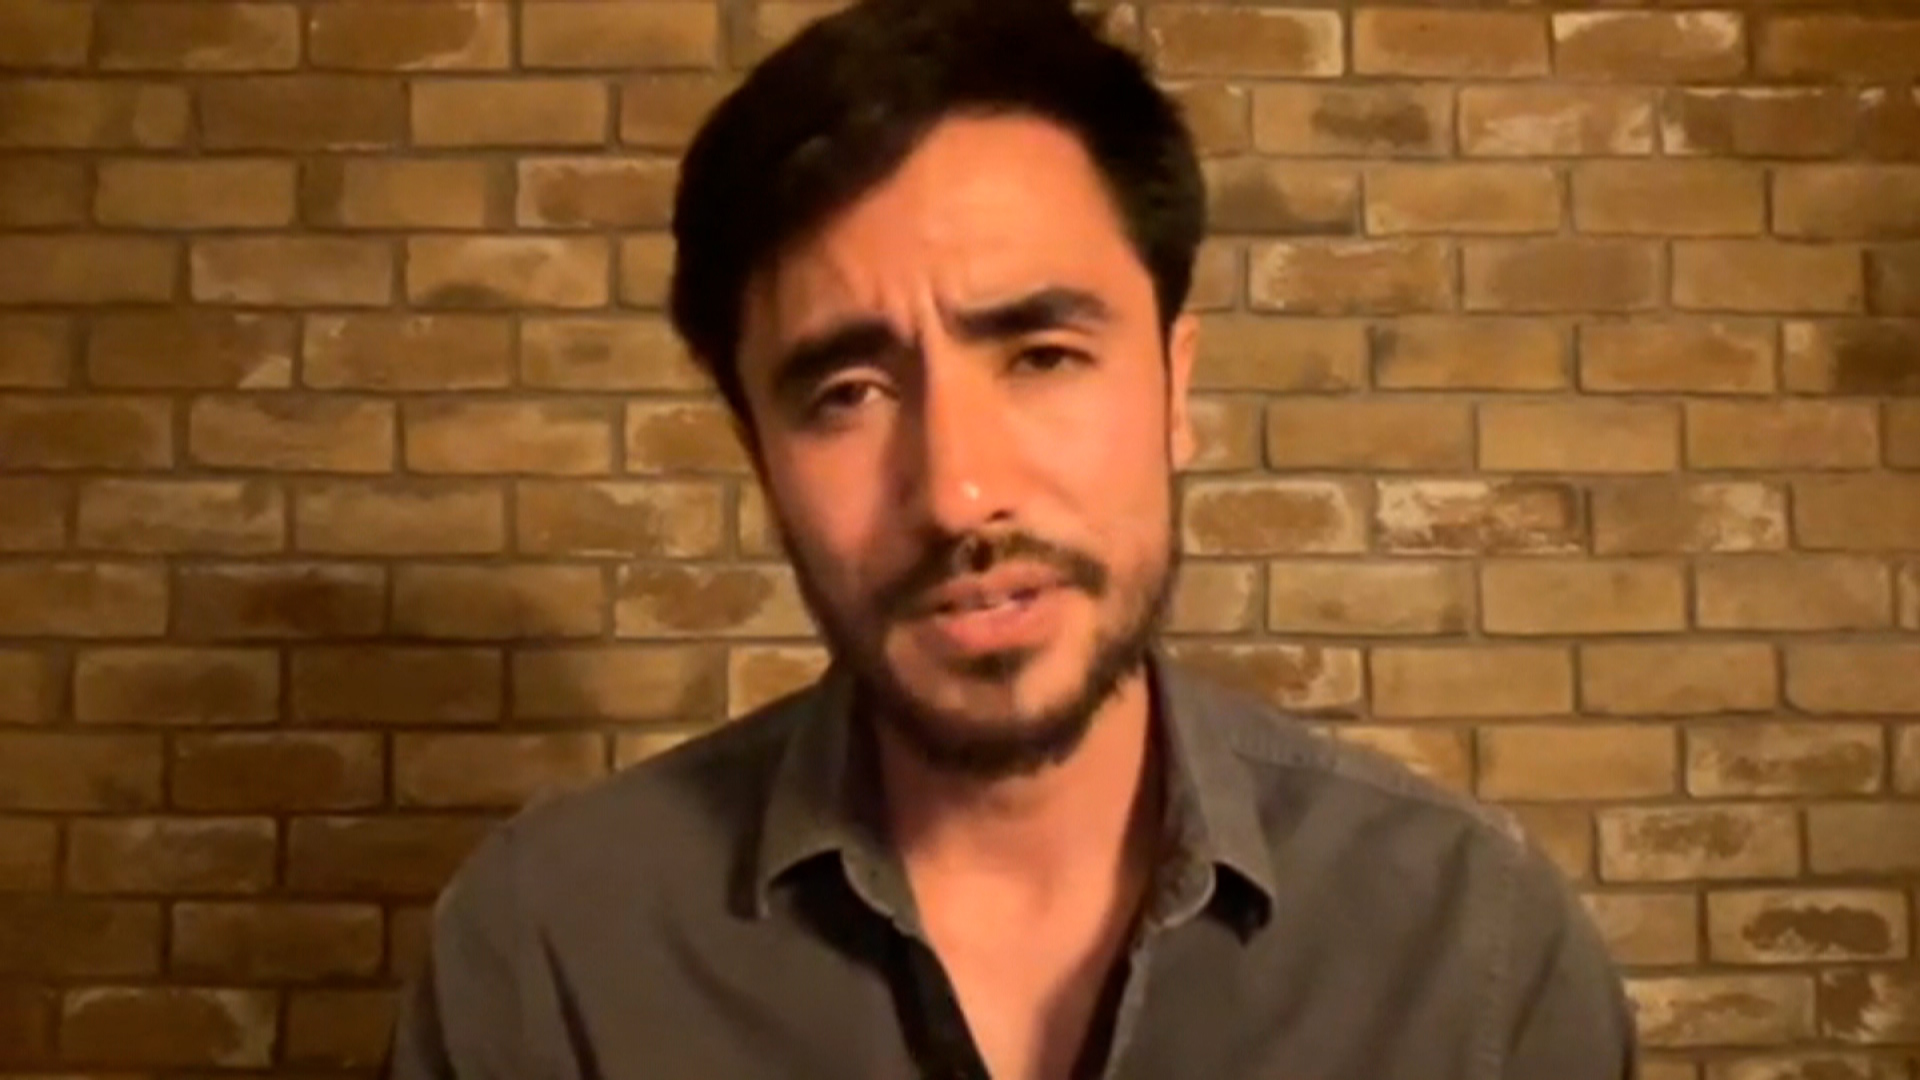 Journalist and author Matthieu Aikins speaks with CNN on Thursday.